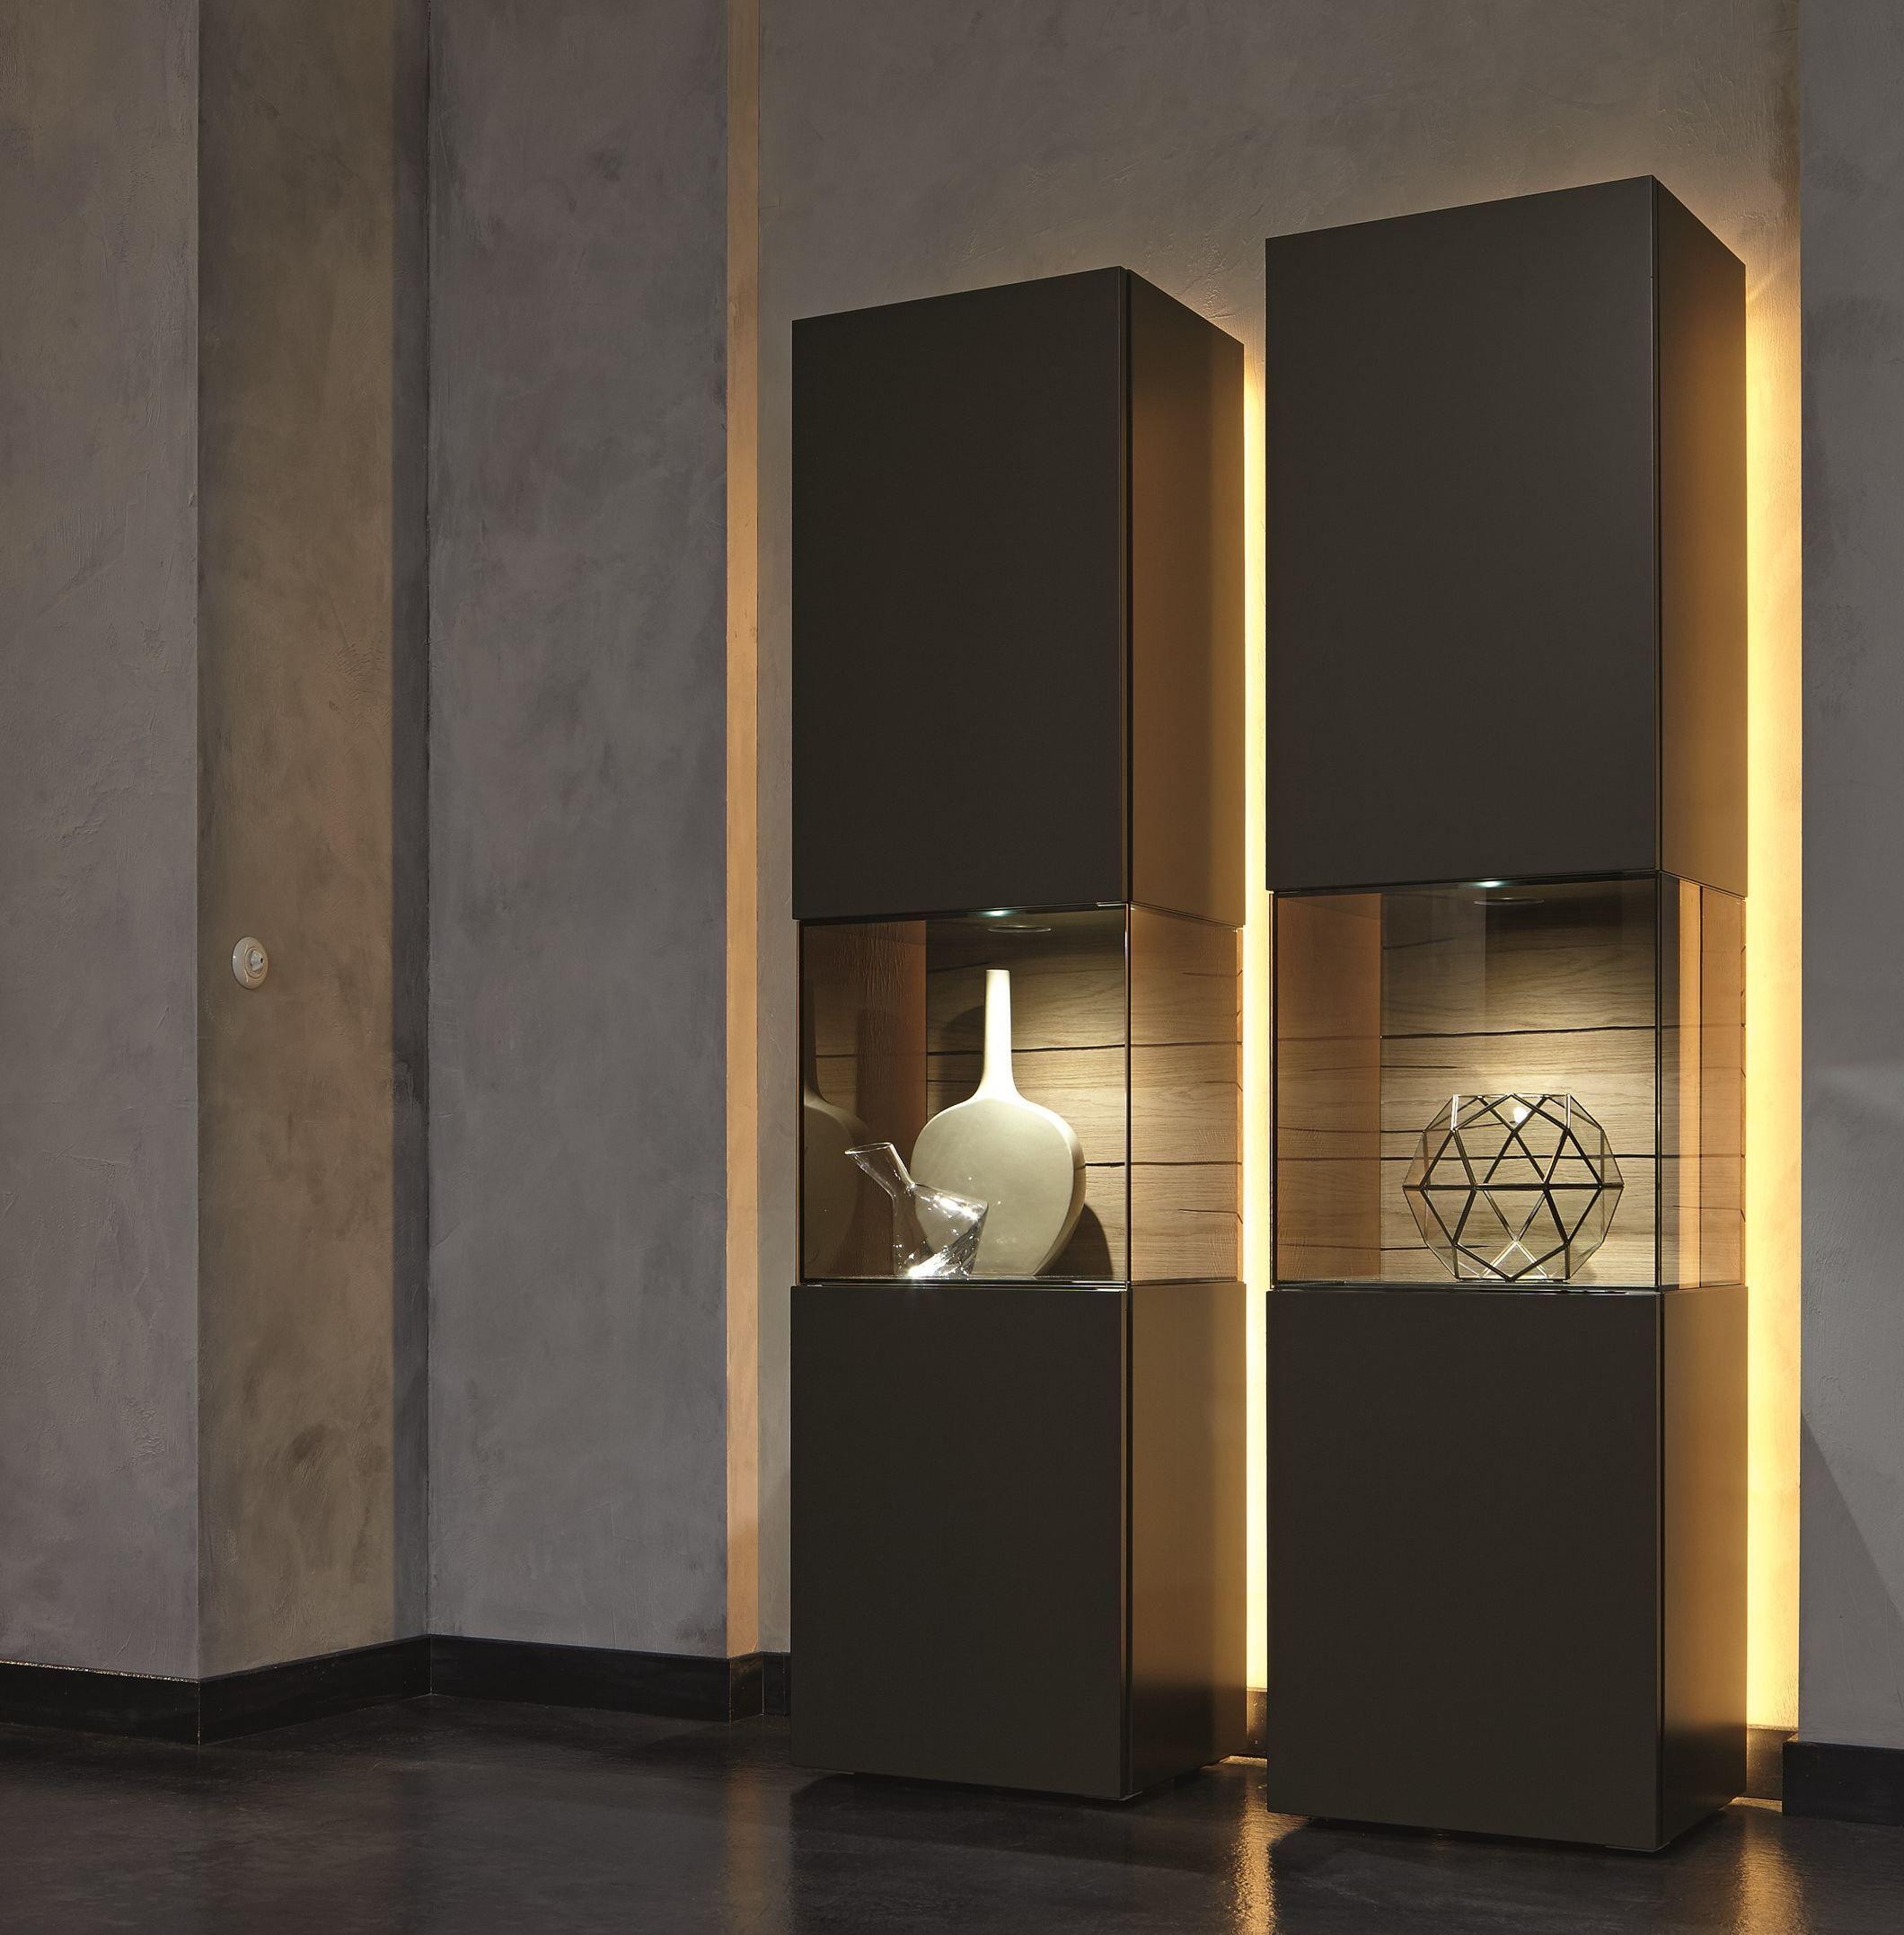 Gentis 展示柜 By Hülsta Werke Hüls 展示柜 Jewelry Store